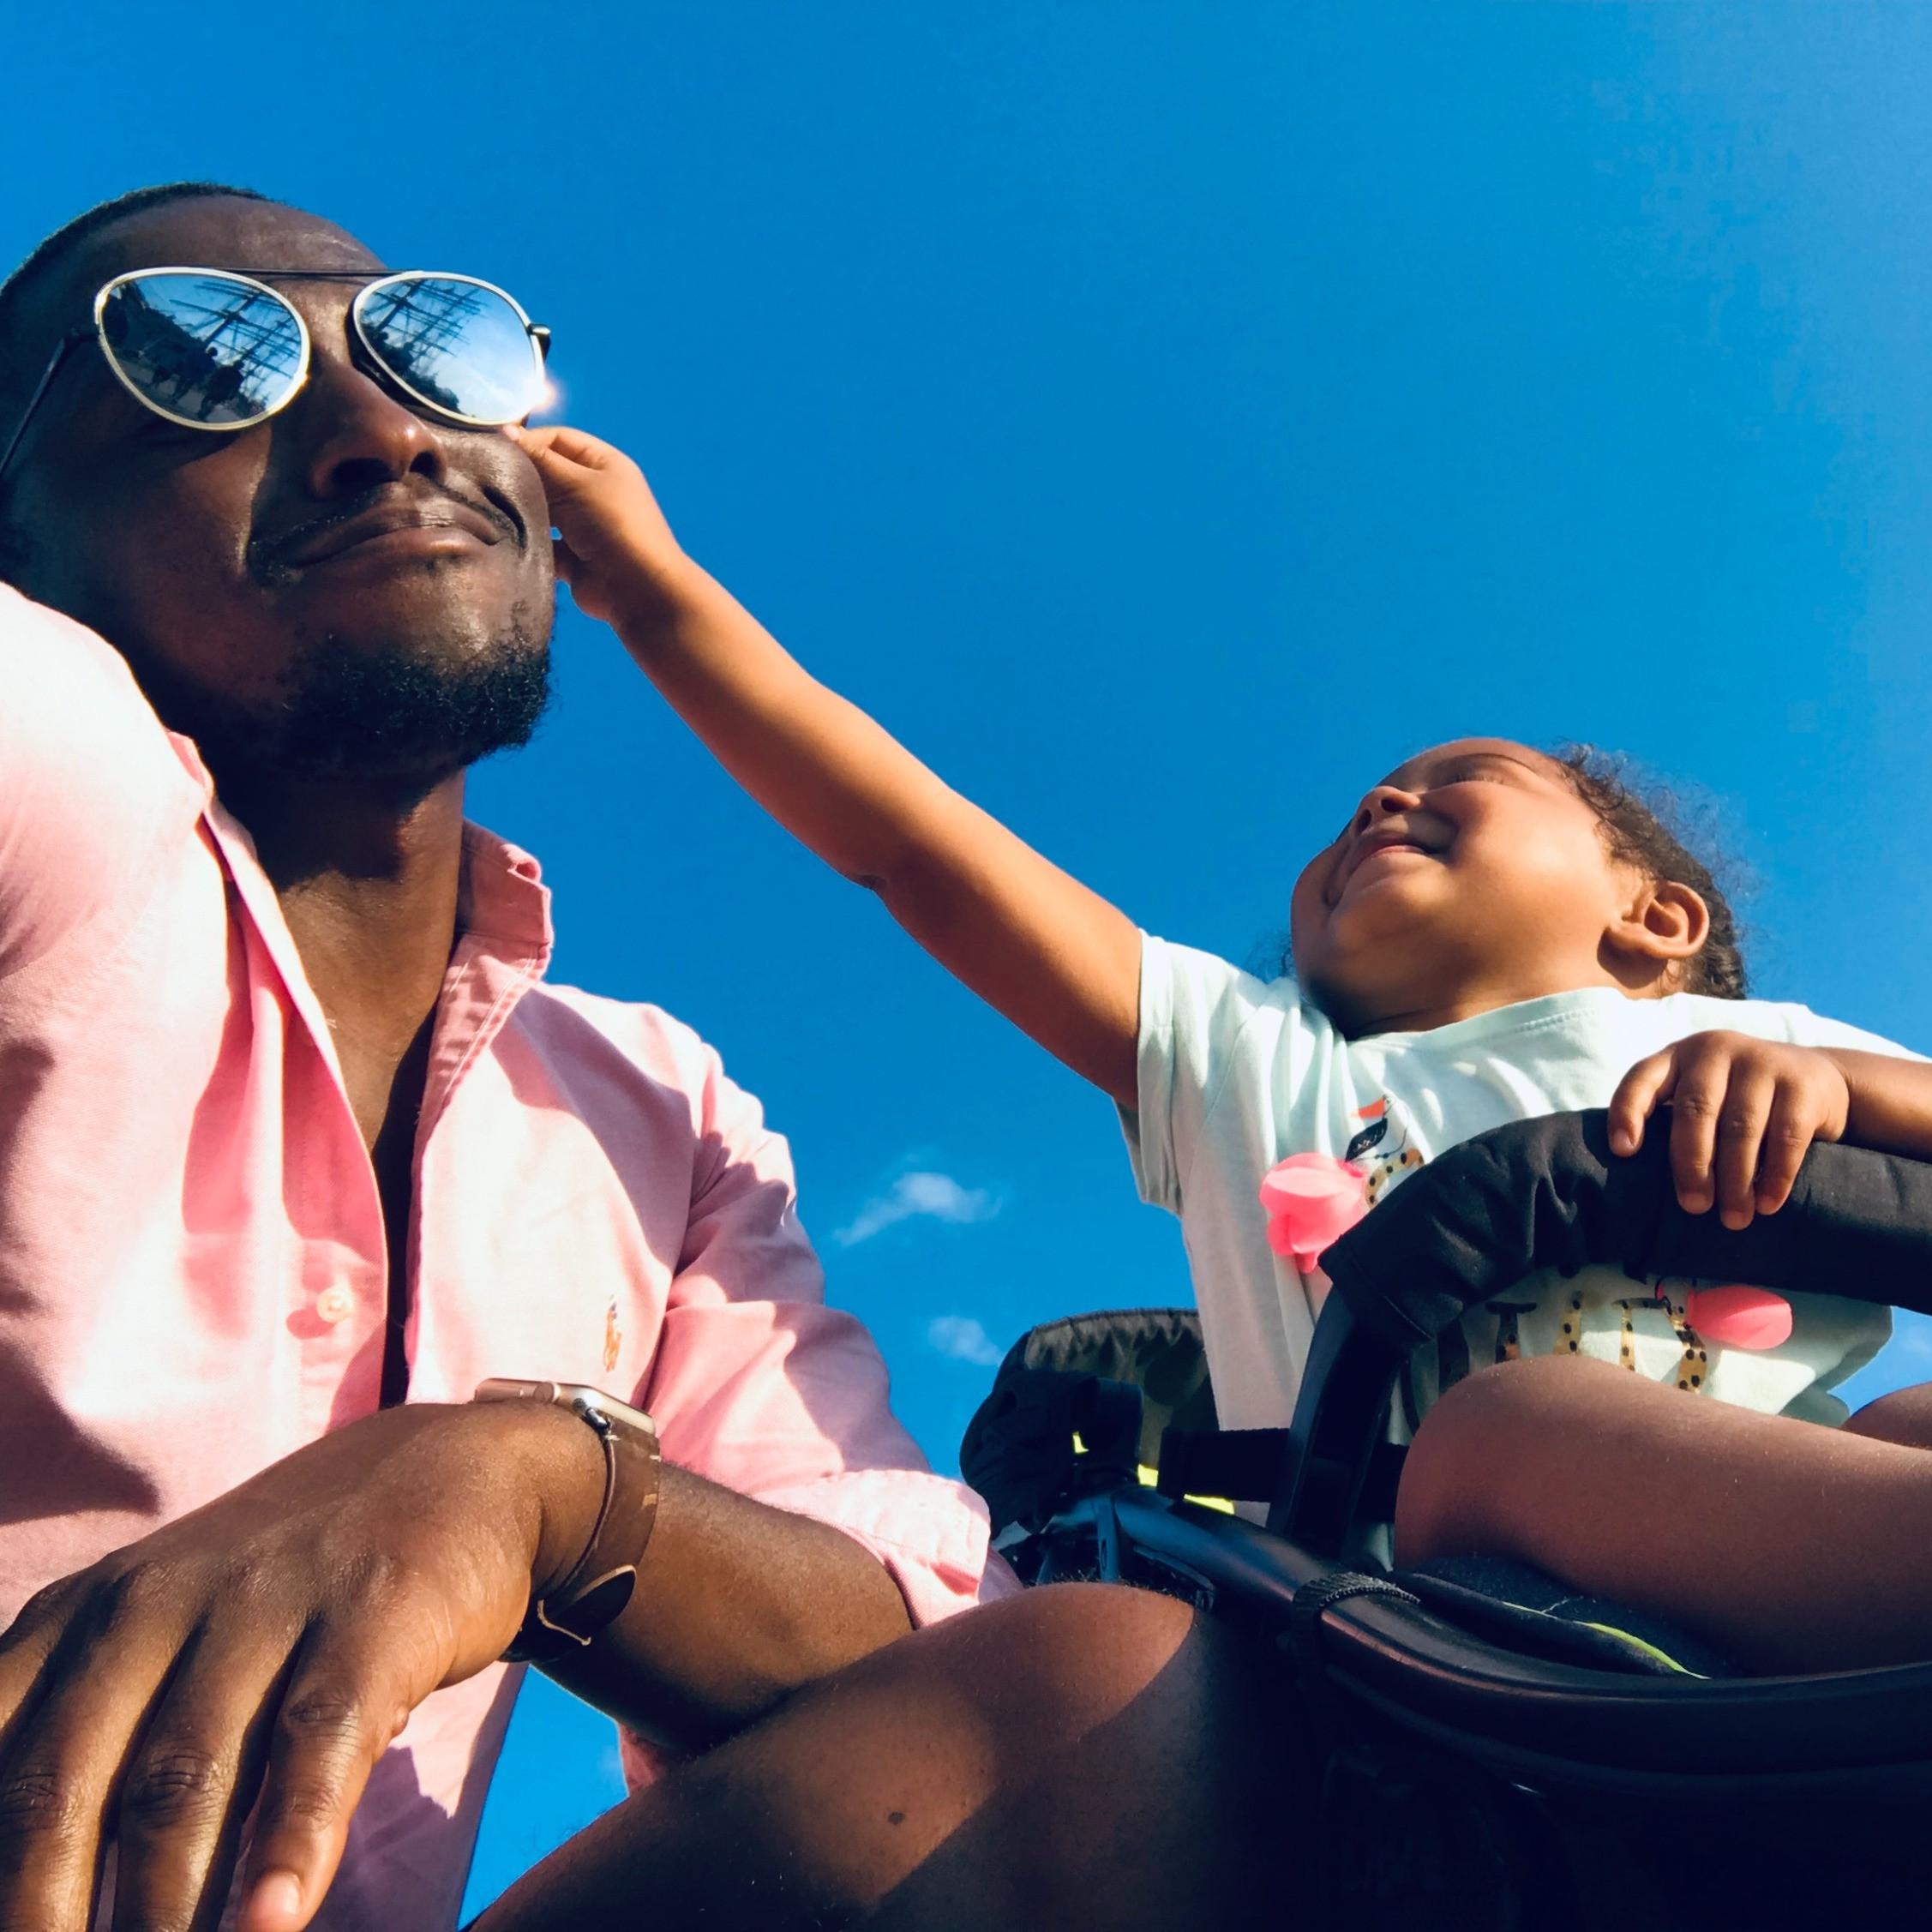 Fathers Self-Care